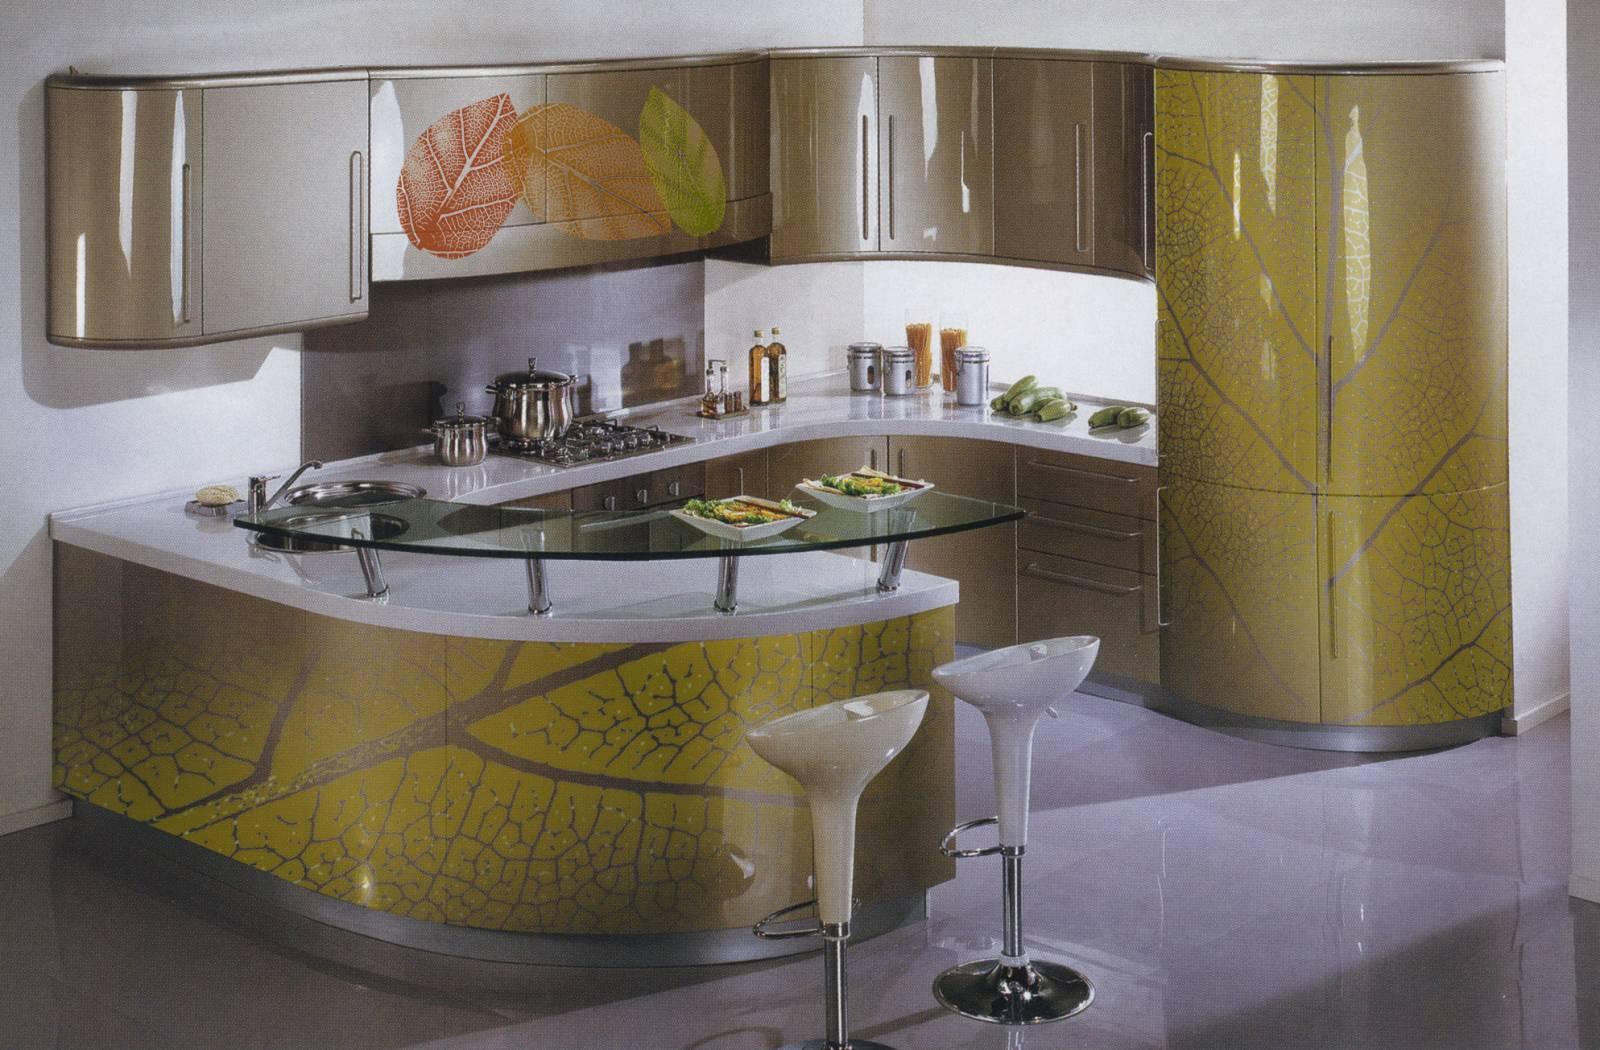 foto desain dapur gratis